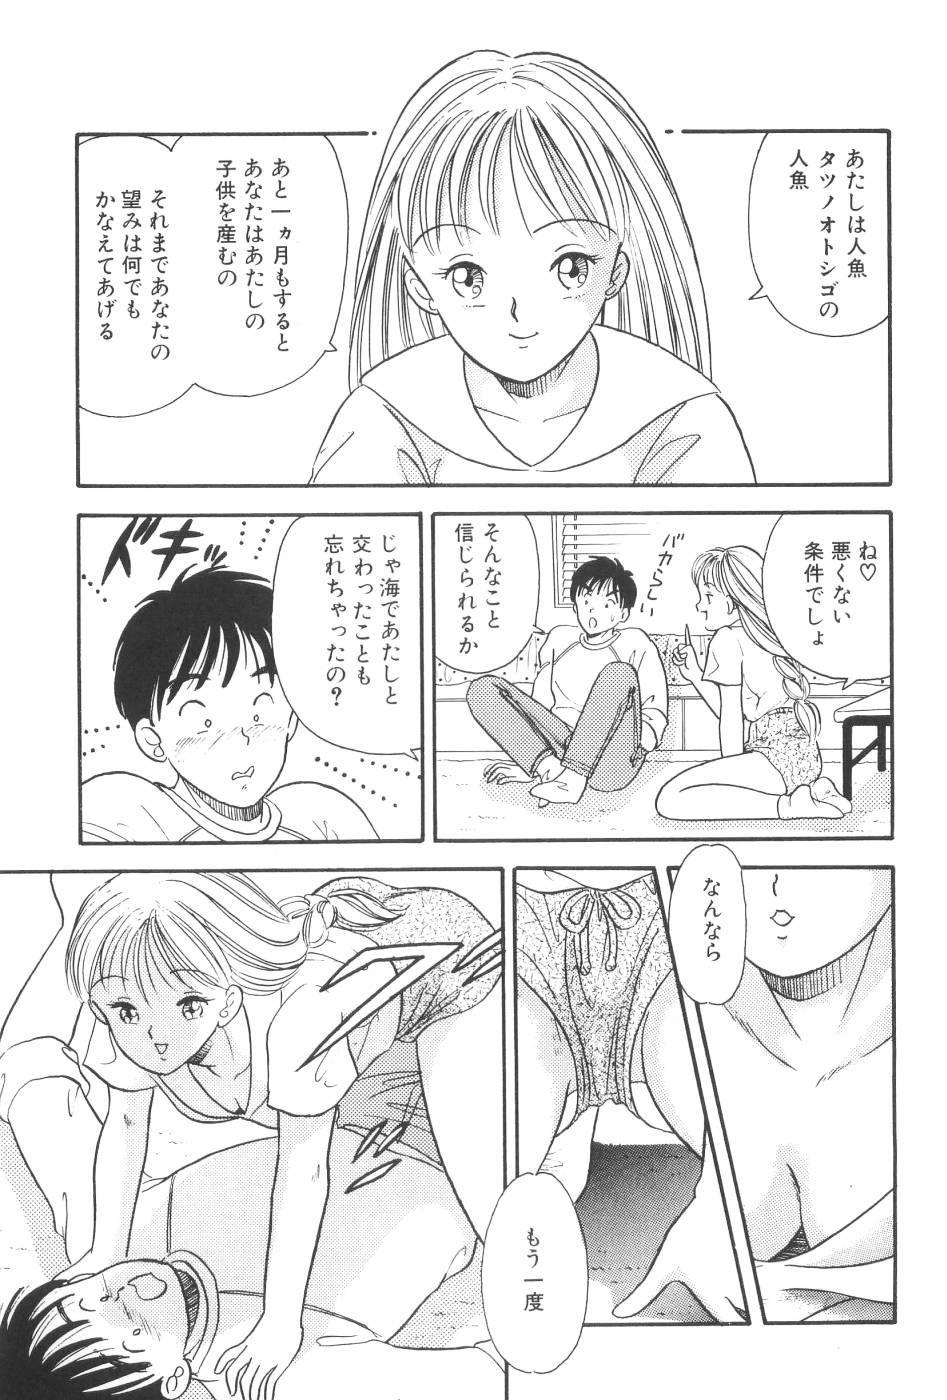 Namioto Densetsu 20